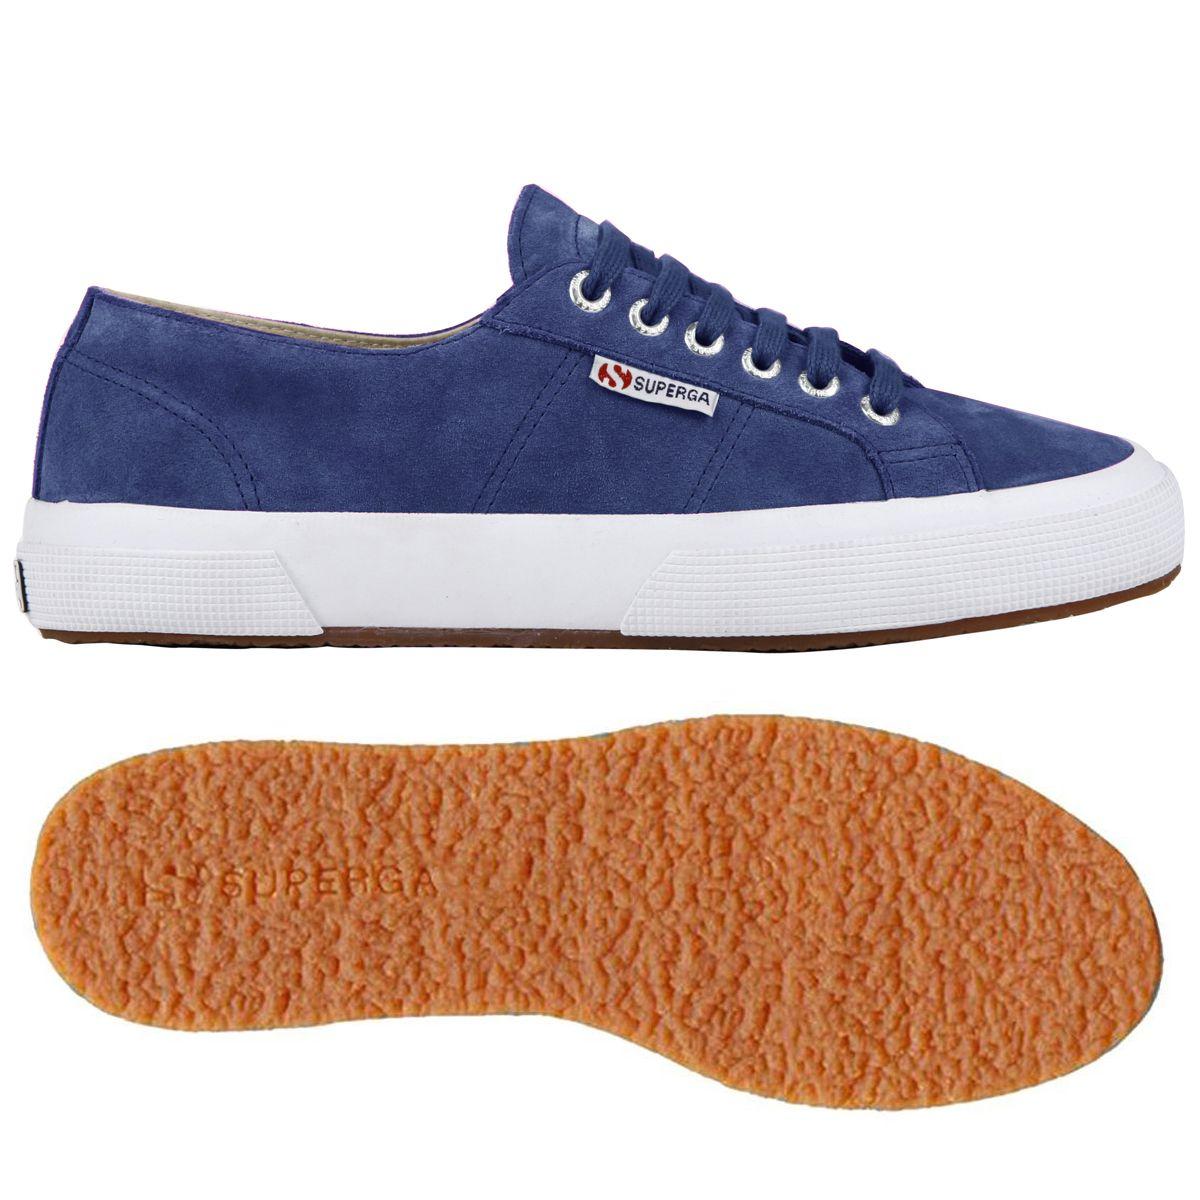 Superga Scarpe ginnastica 2750-SUEU Uomo Donna Casual Sneaker citta